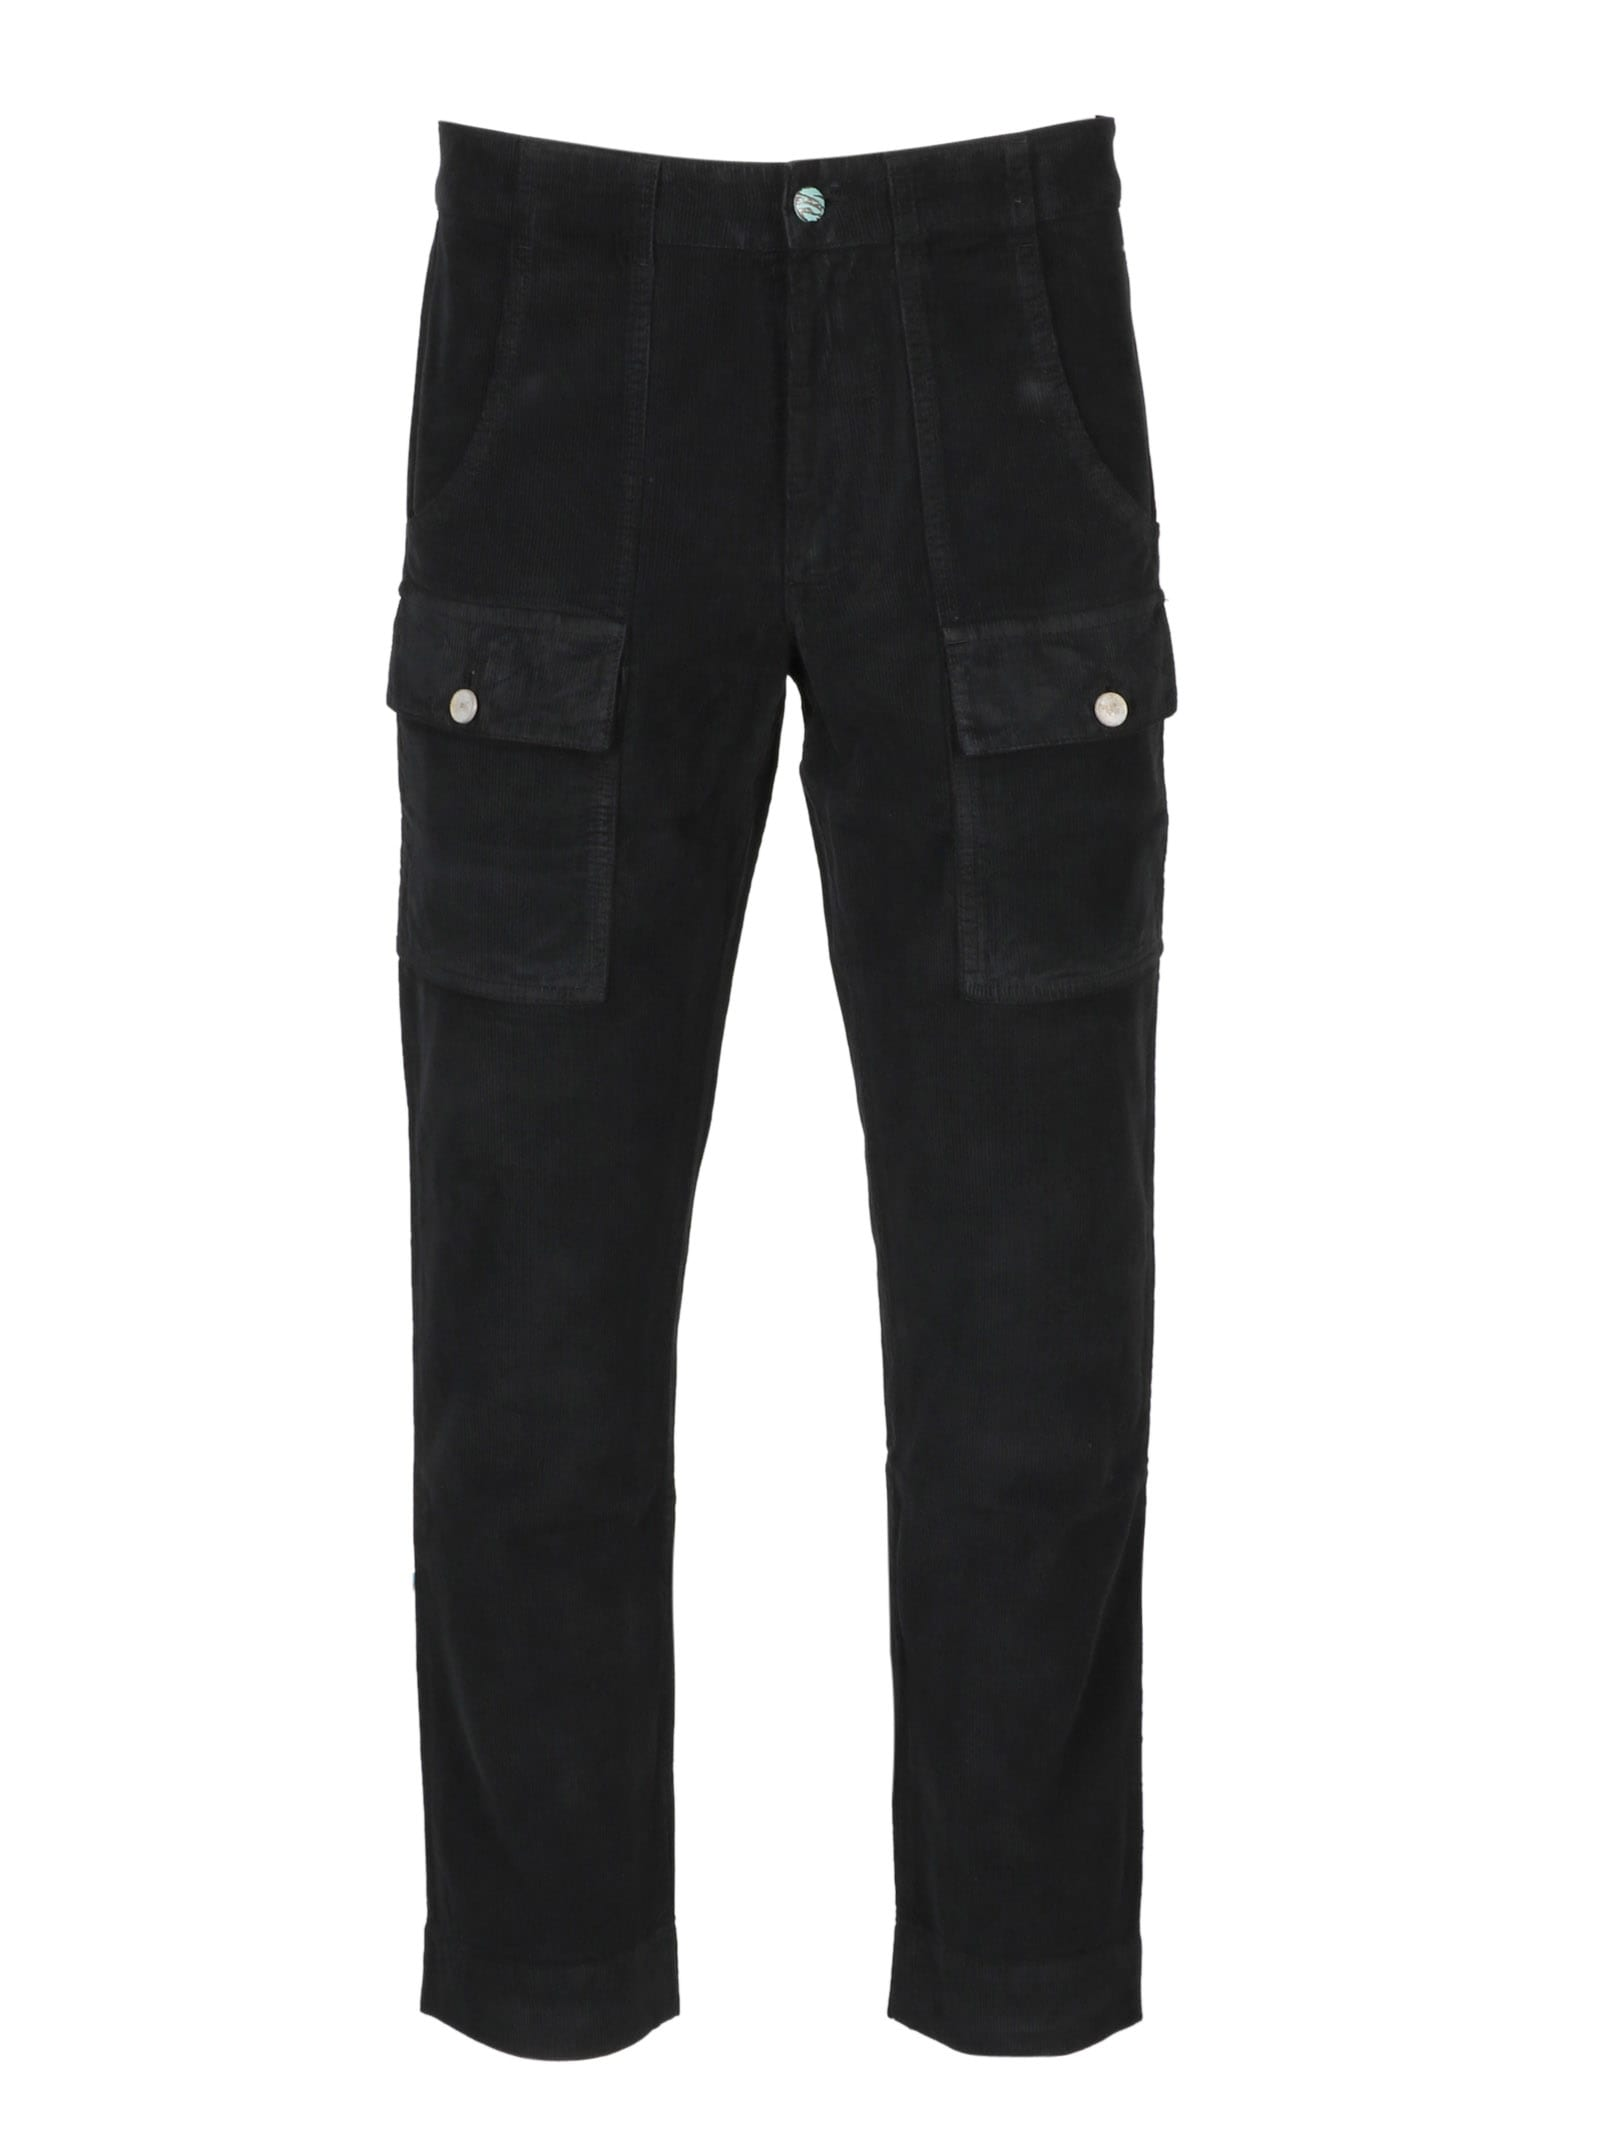 Palm Angels Corduroy Pockets Pants